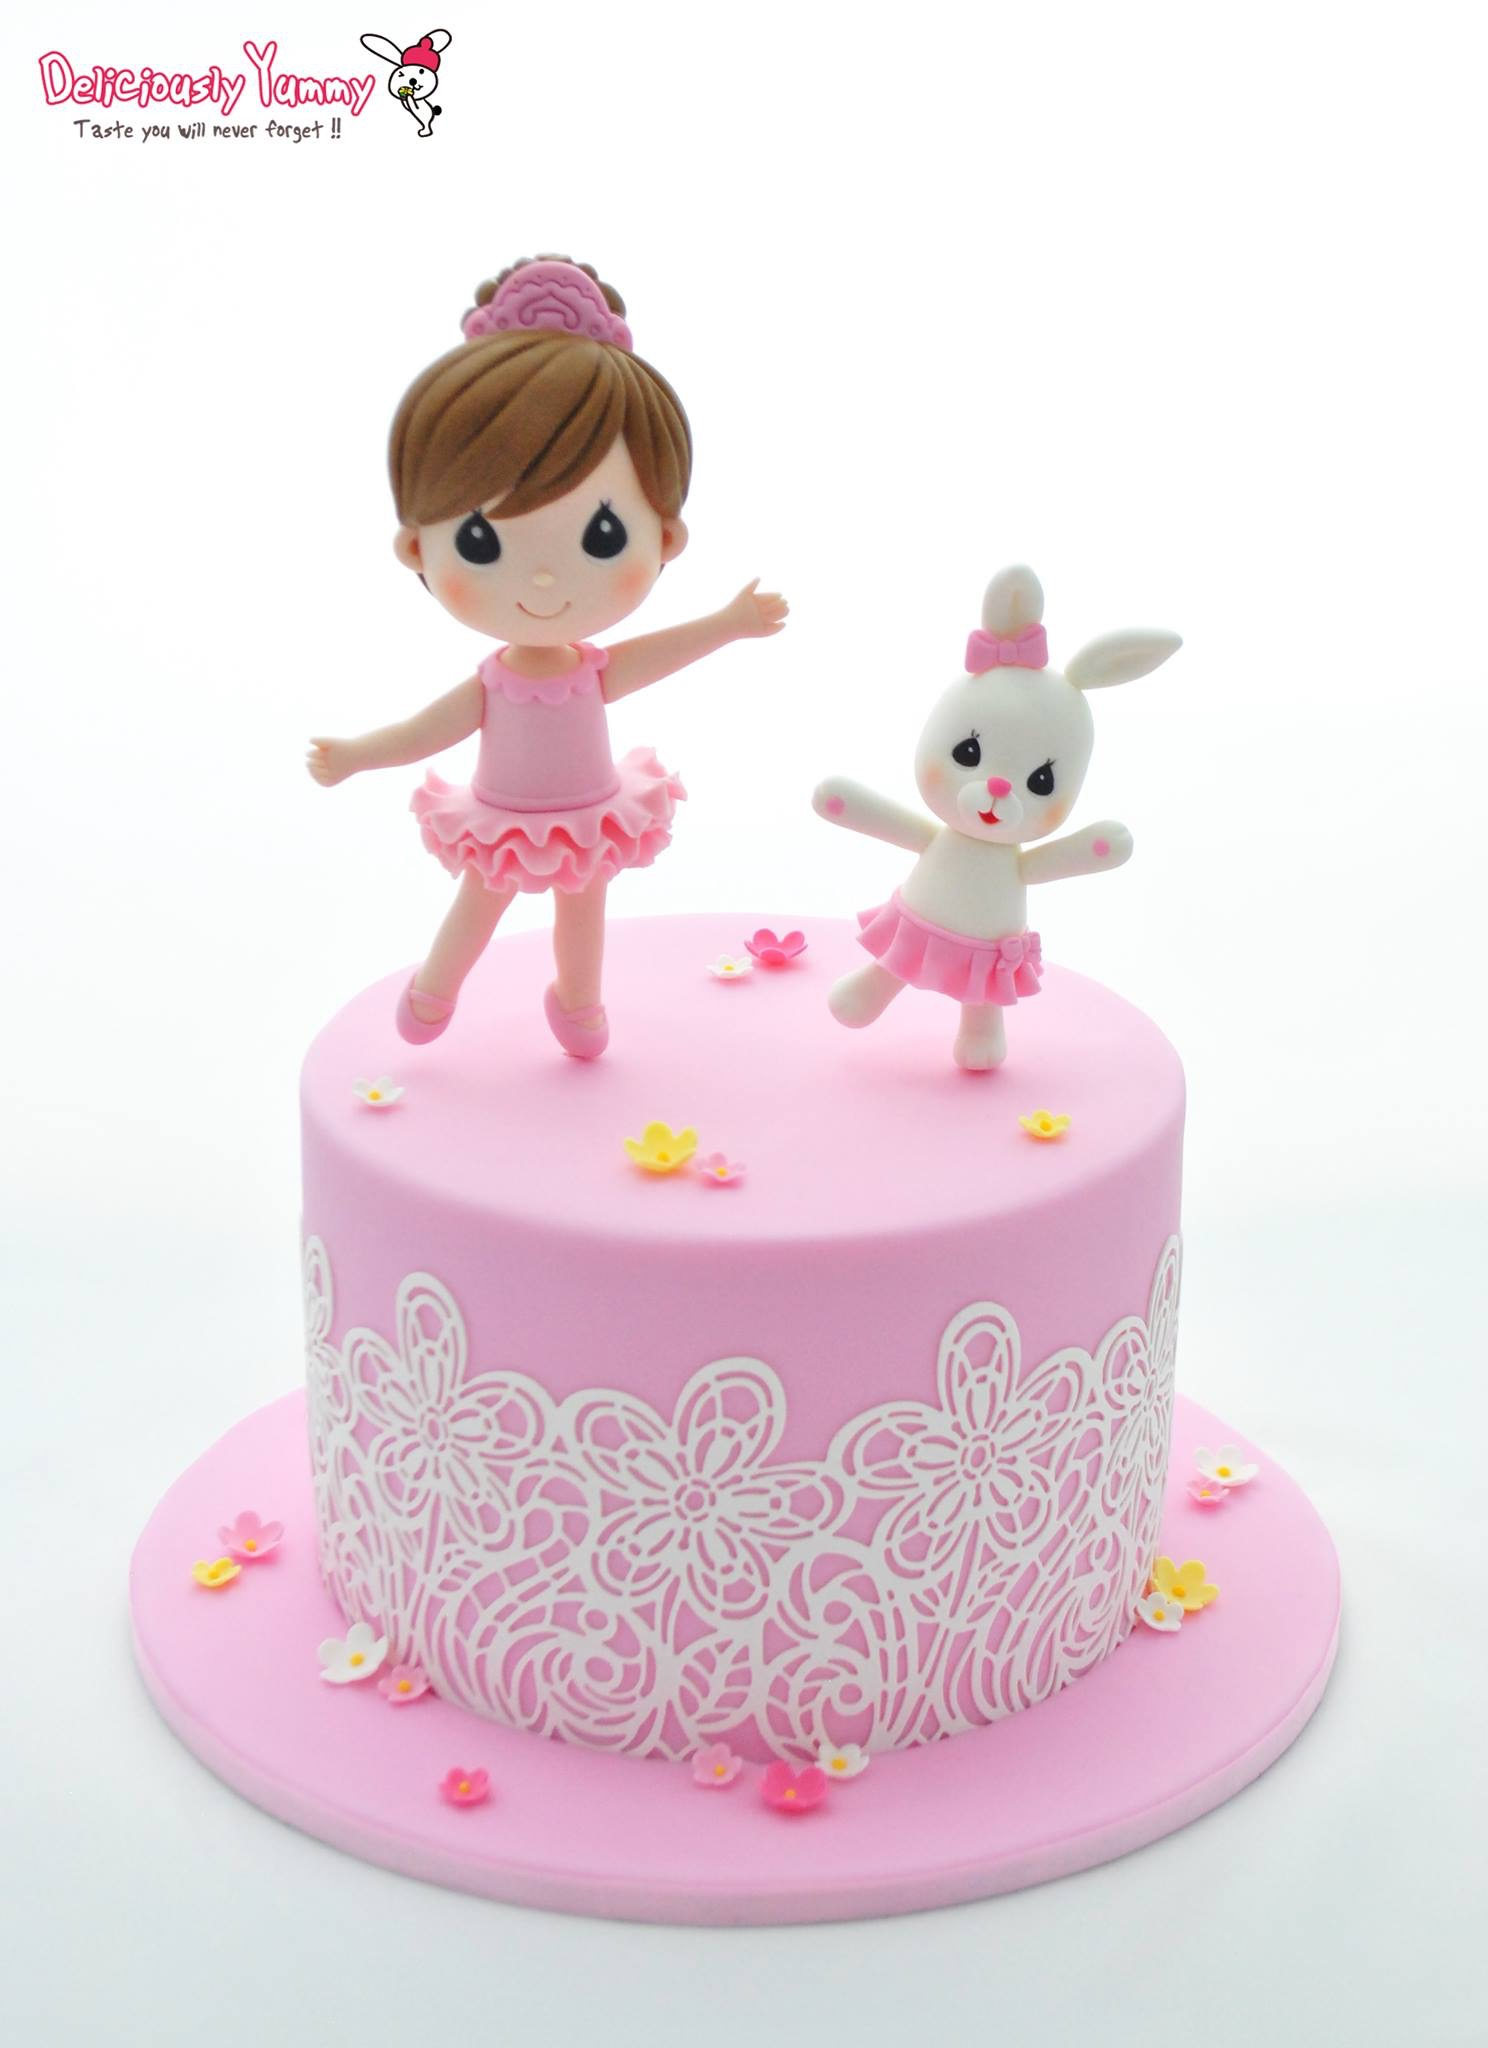 Remarkable Cute Birthday Cakes For Girl 10 Totally Gorgeous Birthday Cakes Funny Birthday Cards Online Drosicarndamsfinfo